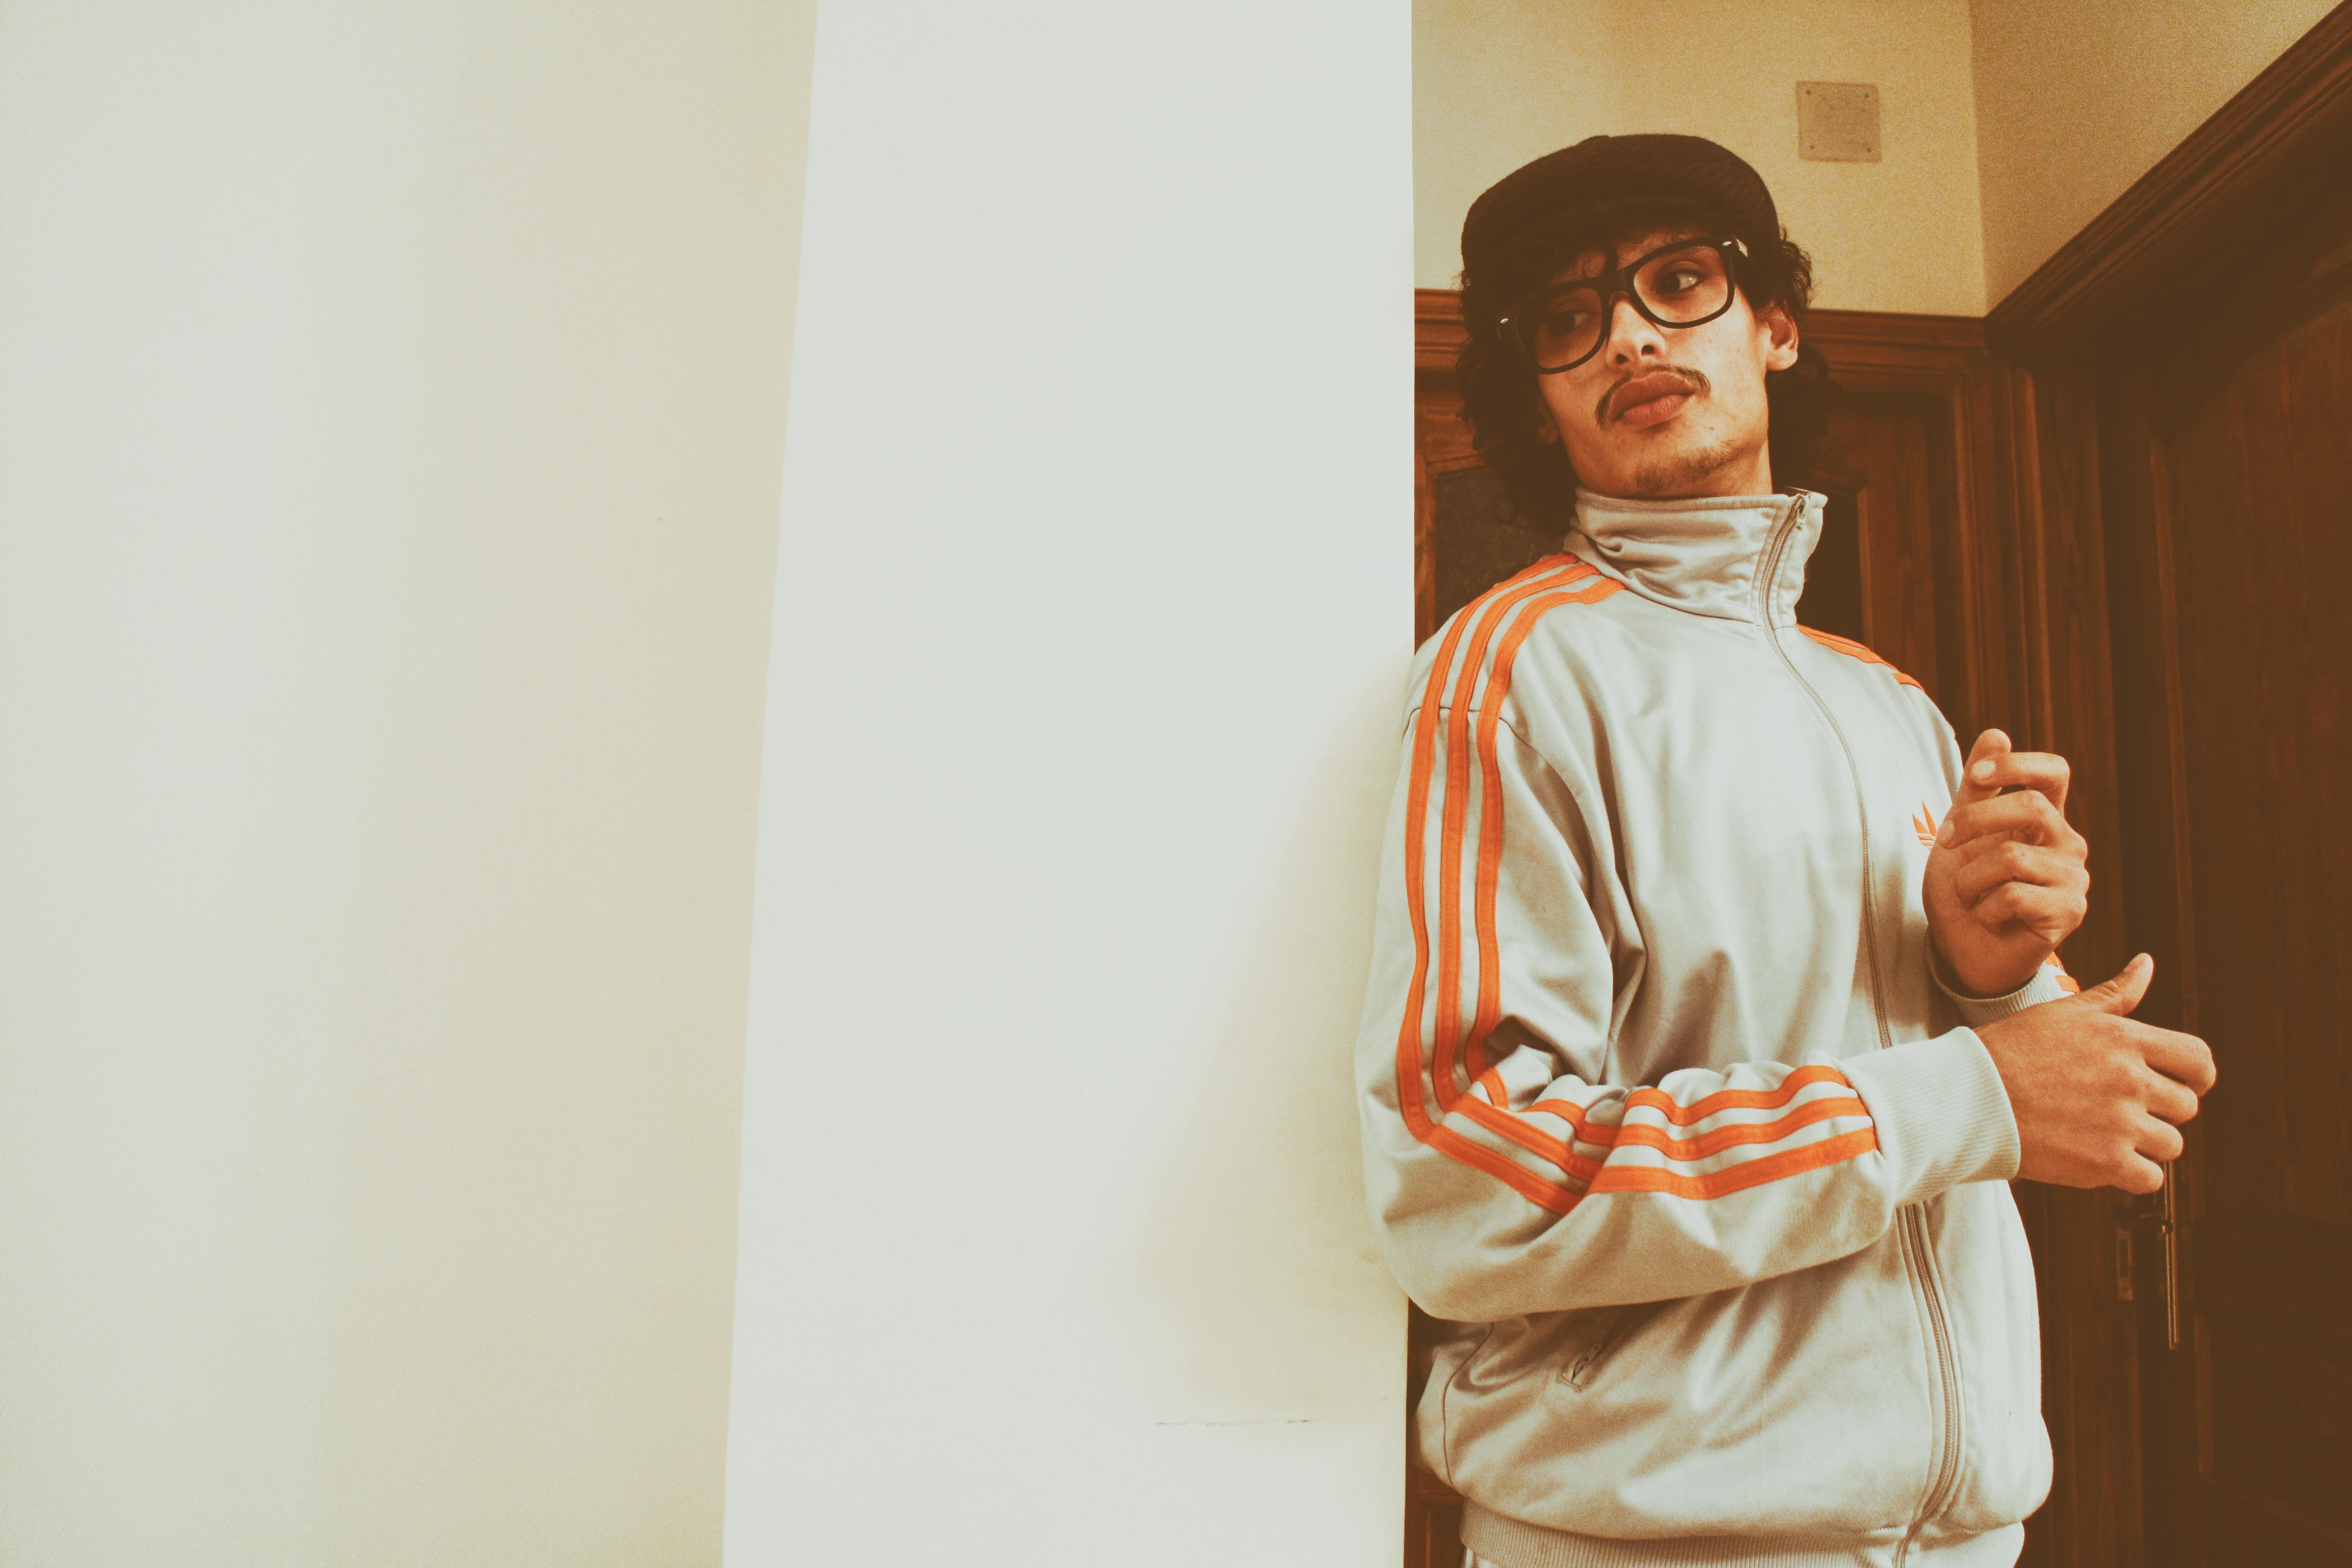 man wearing Adidas jacket leaning on wall